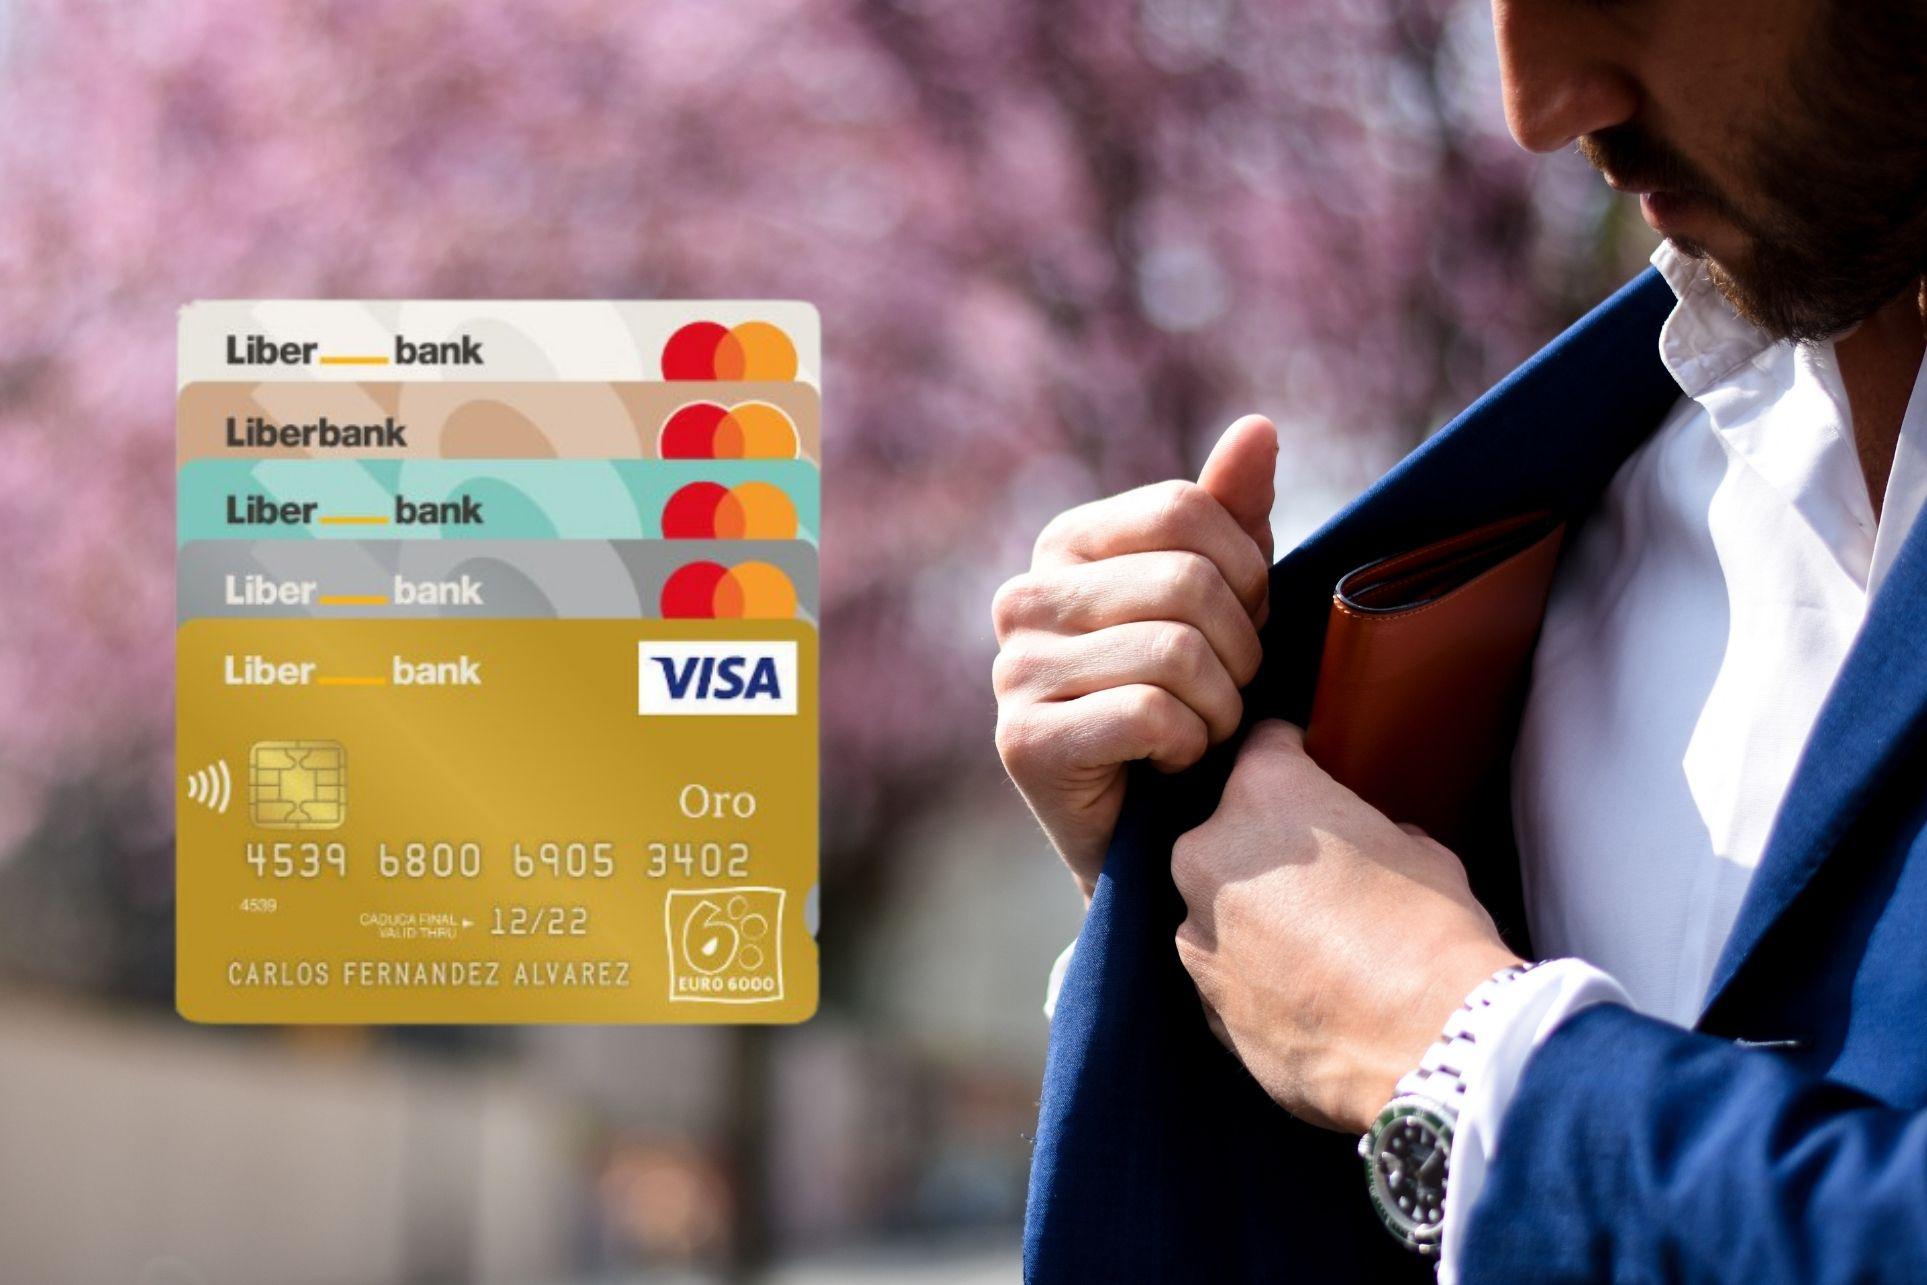 Cómo Reclamar Tarjeta Revolving Liberbank